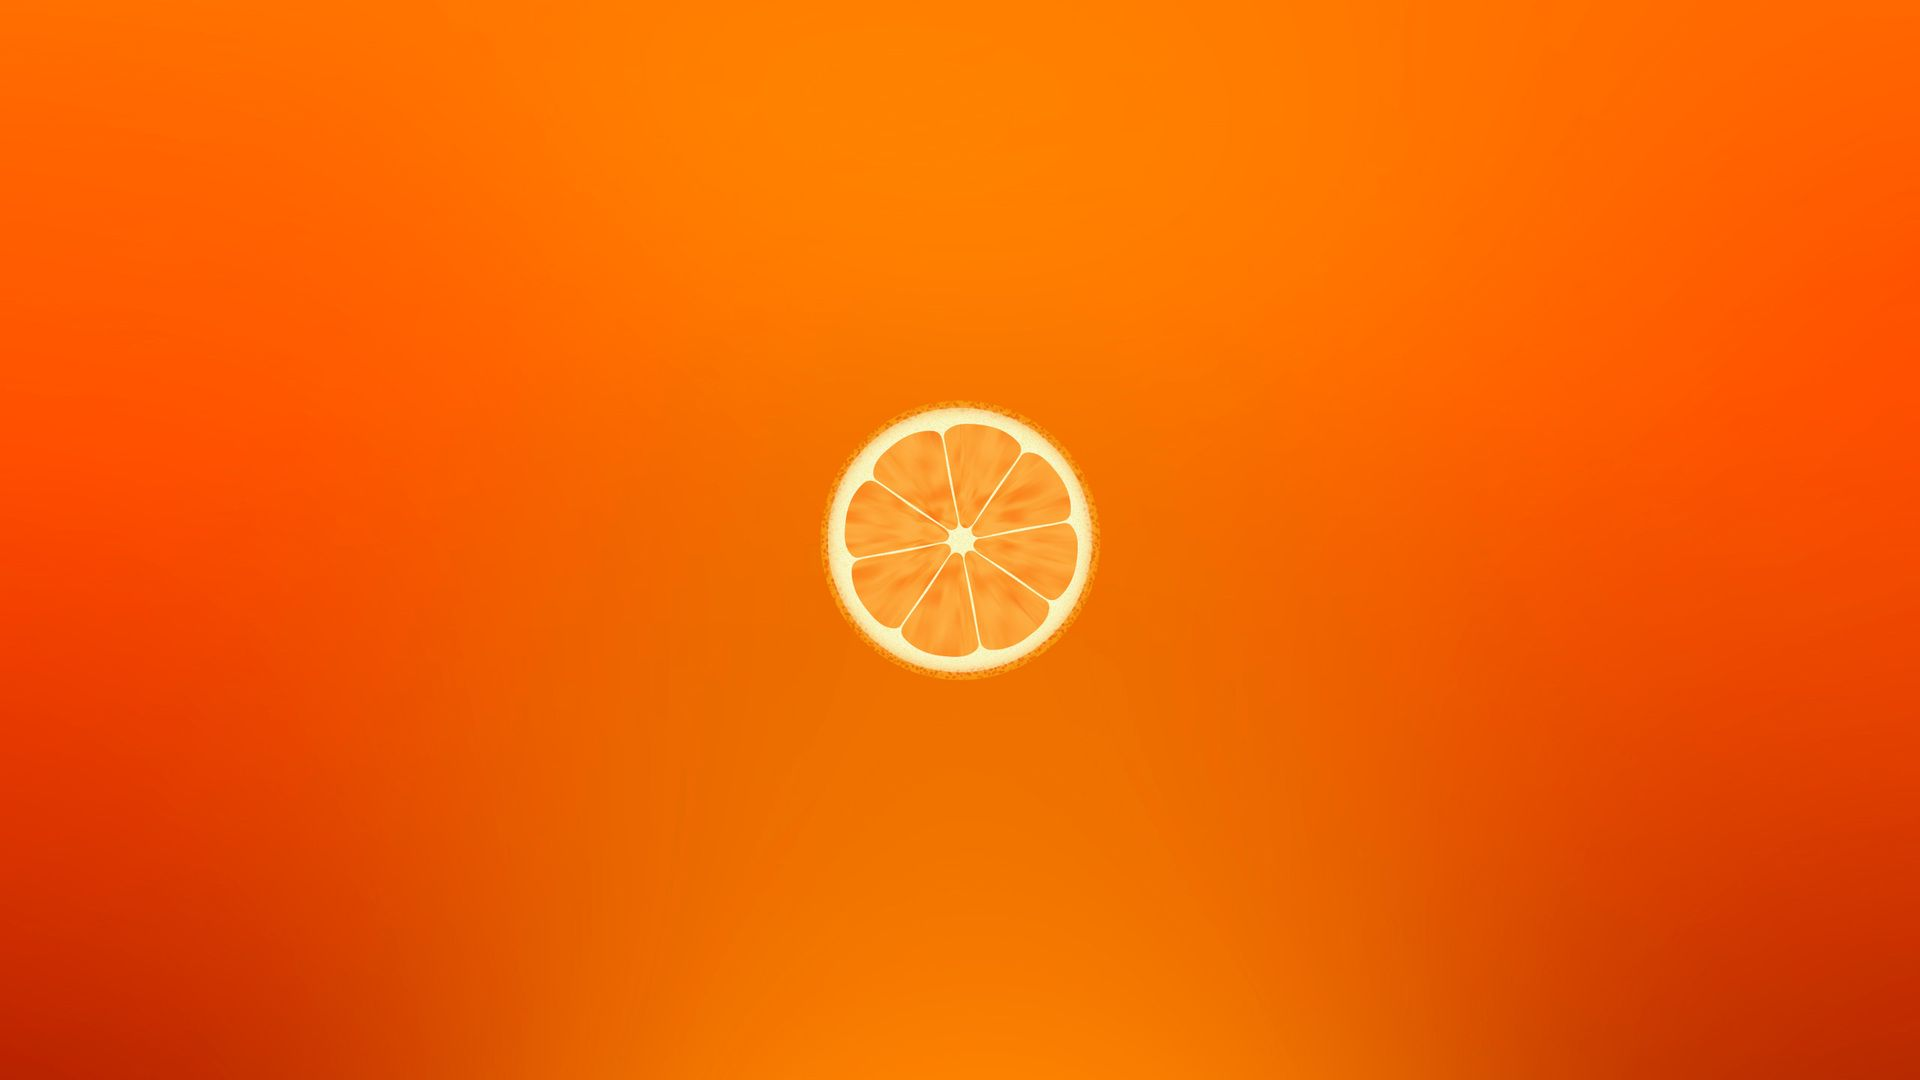 Orange Desktop Wallpaper